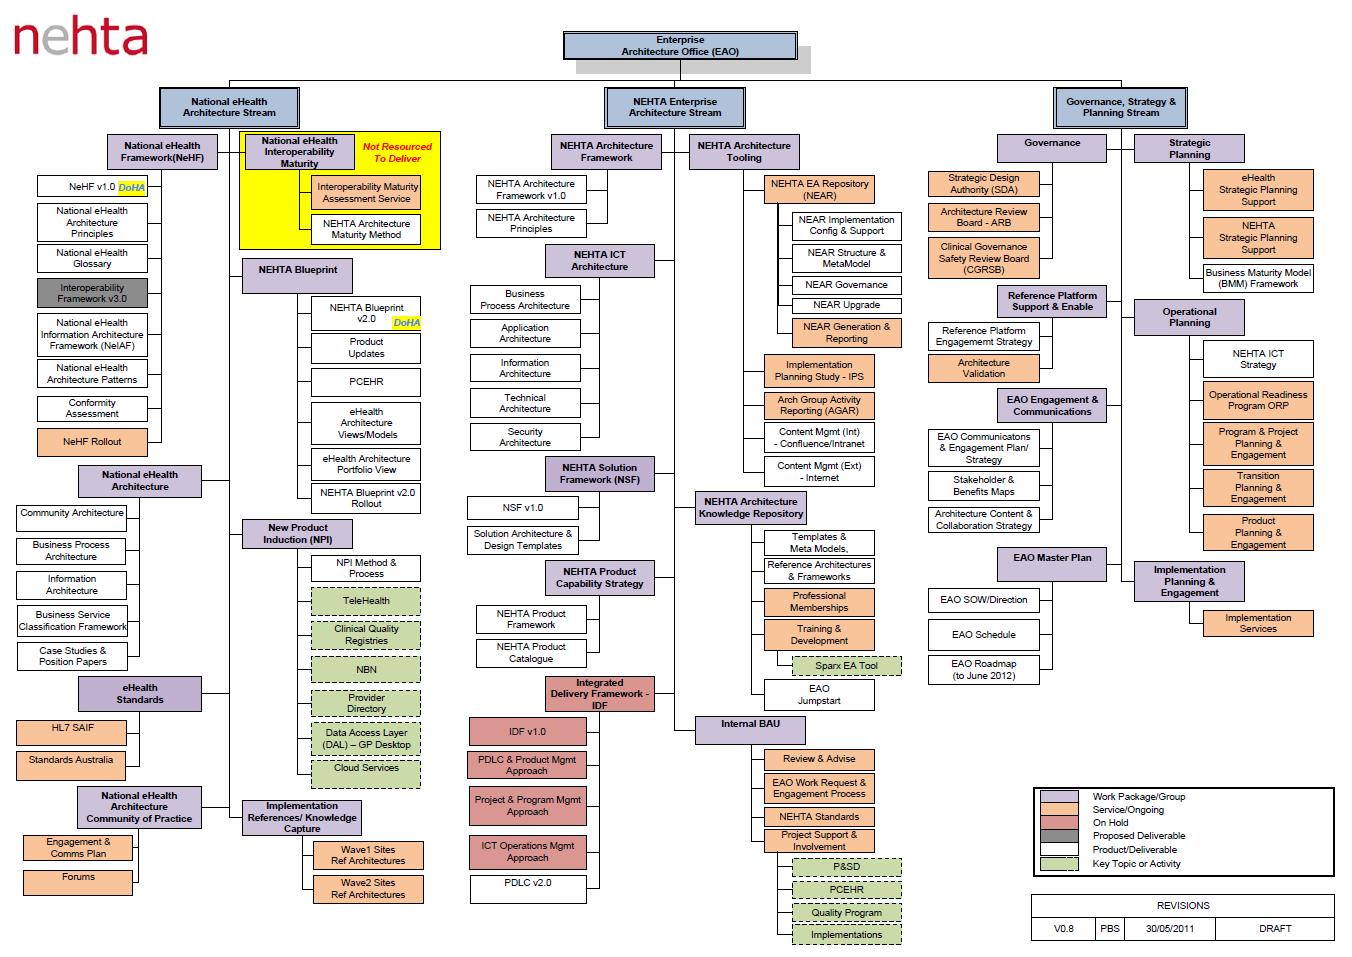 organisation structure of ubisoft